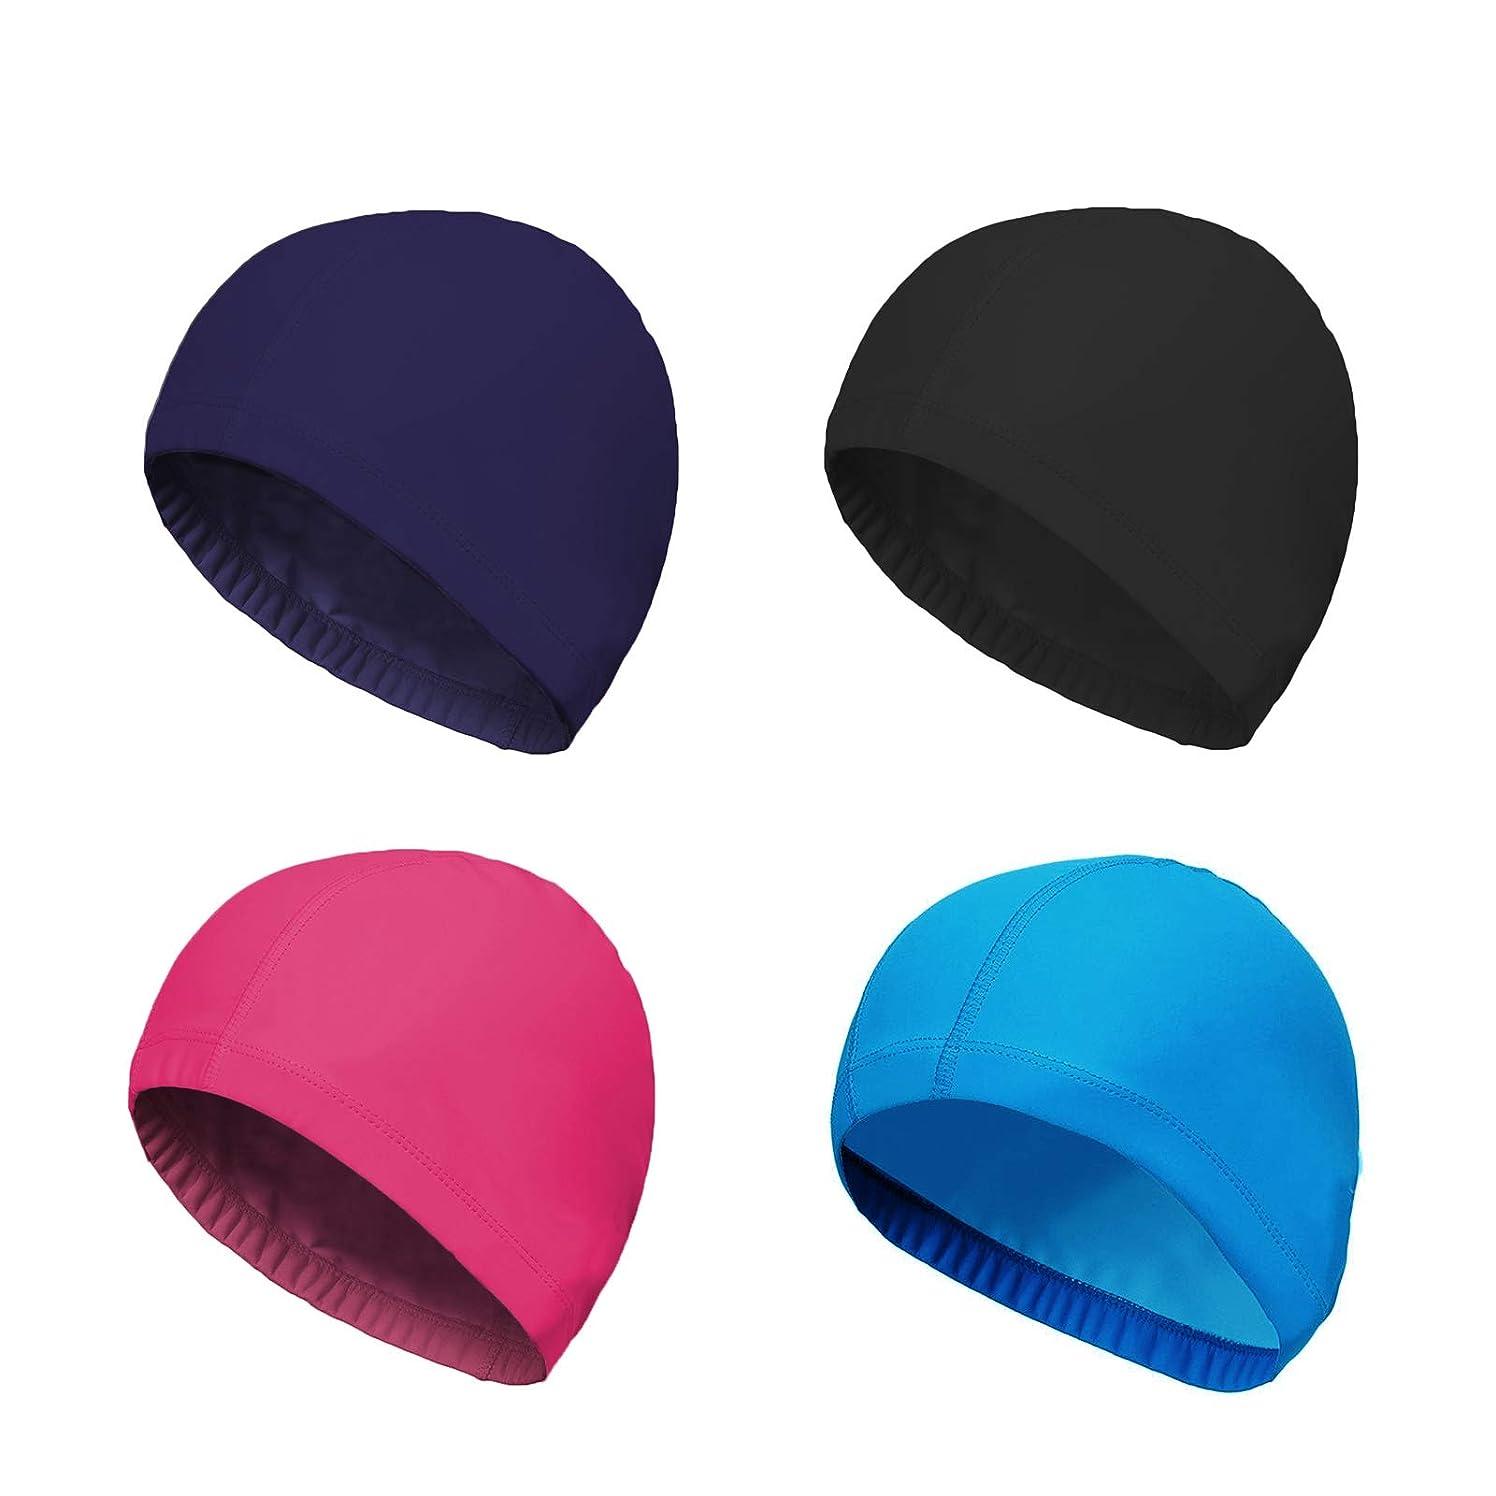 SunTrade 4-Pack Man Women Pure Color Nylon Spandex Fabric Swim Cap Swimming Cap Bathing Cap